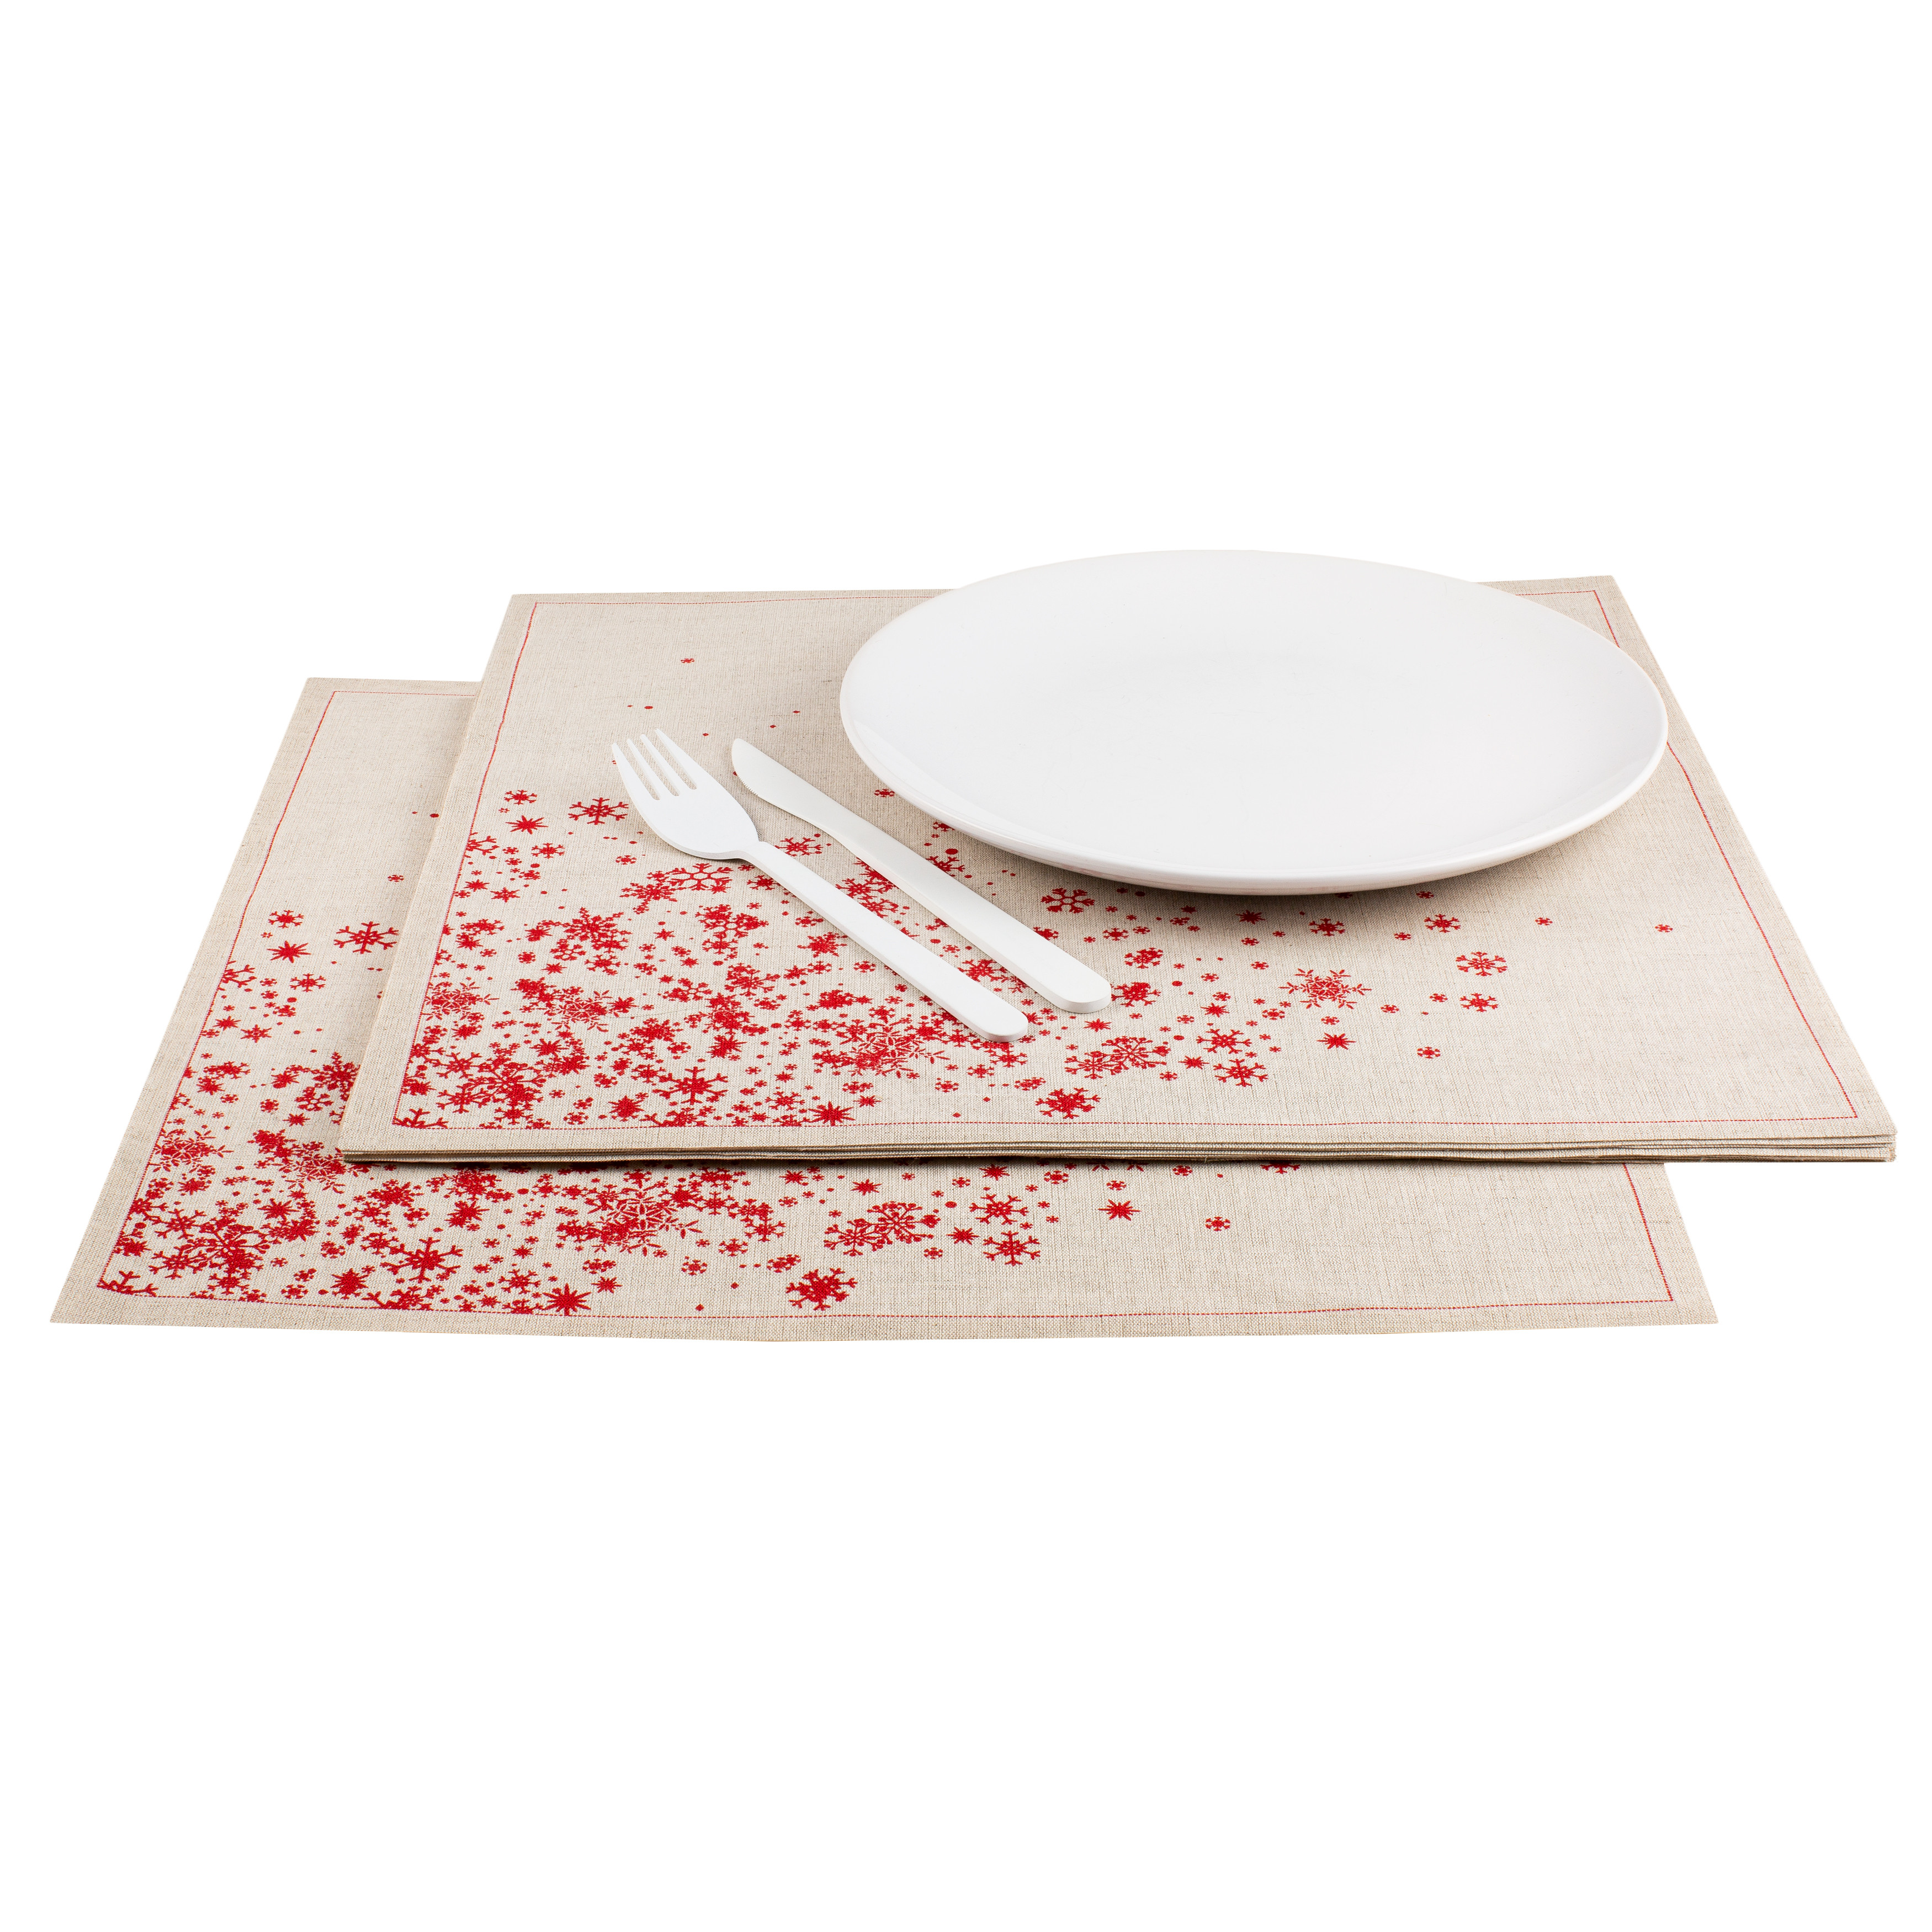 "Snowflake Cascade Natural Linen Premium Dinner - 15.8"" x 15.8"" - 120 Units"